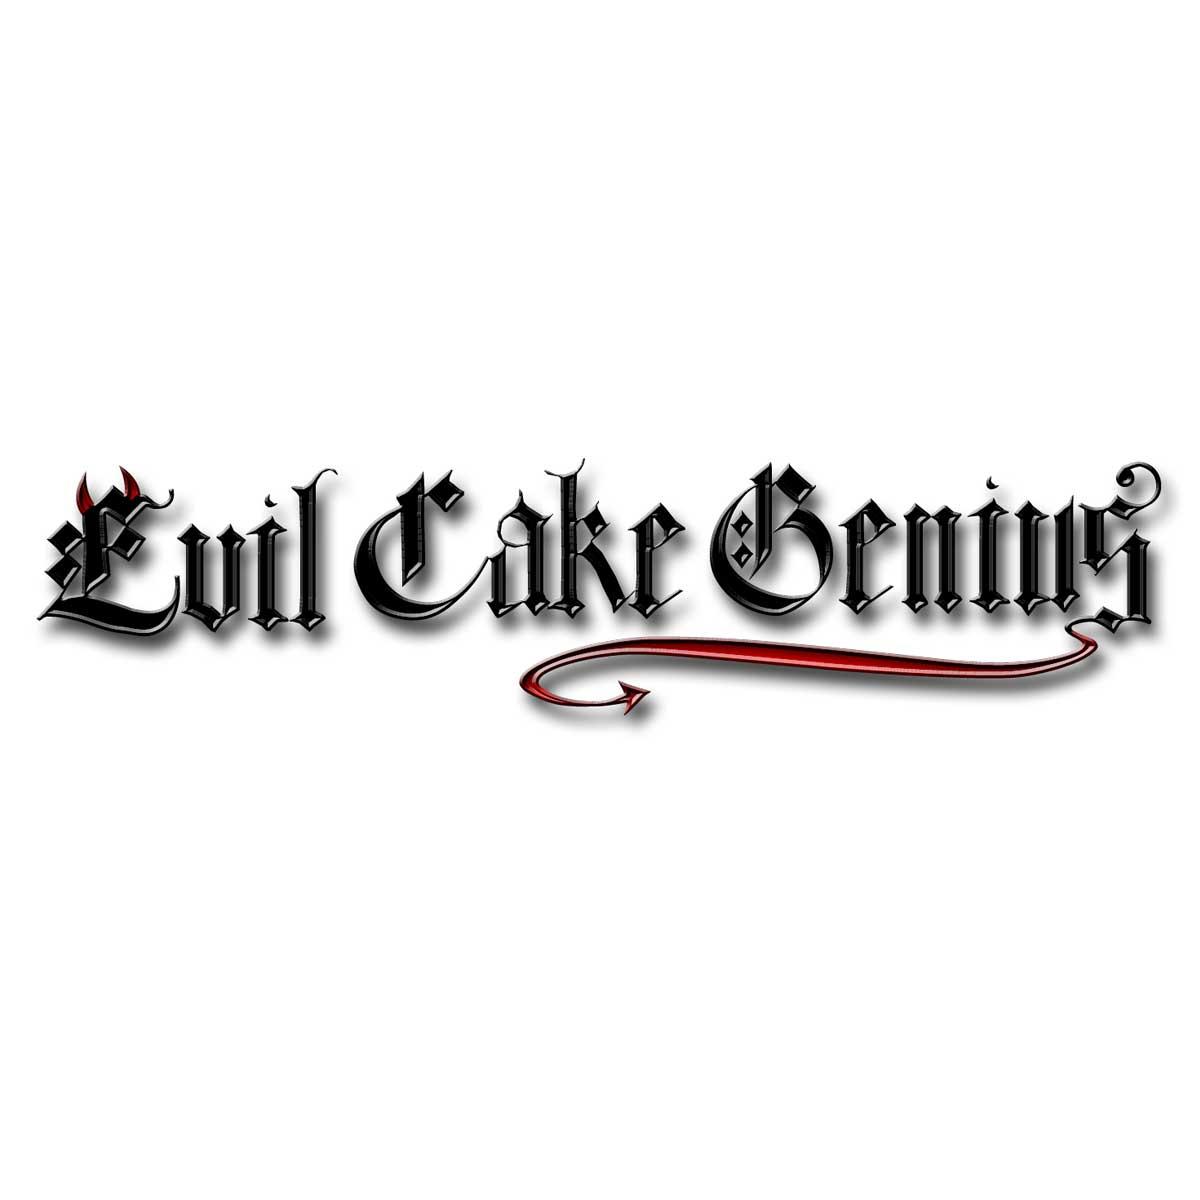 Beauteous Baluster Contour Combs Evil Cake Genius